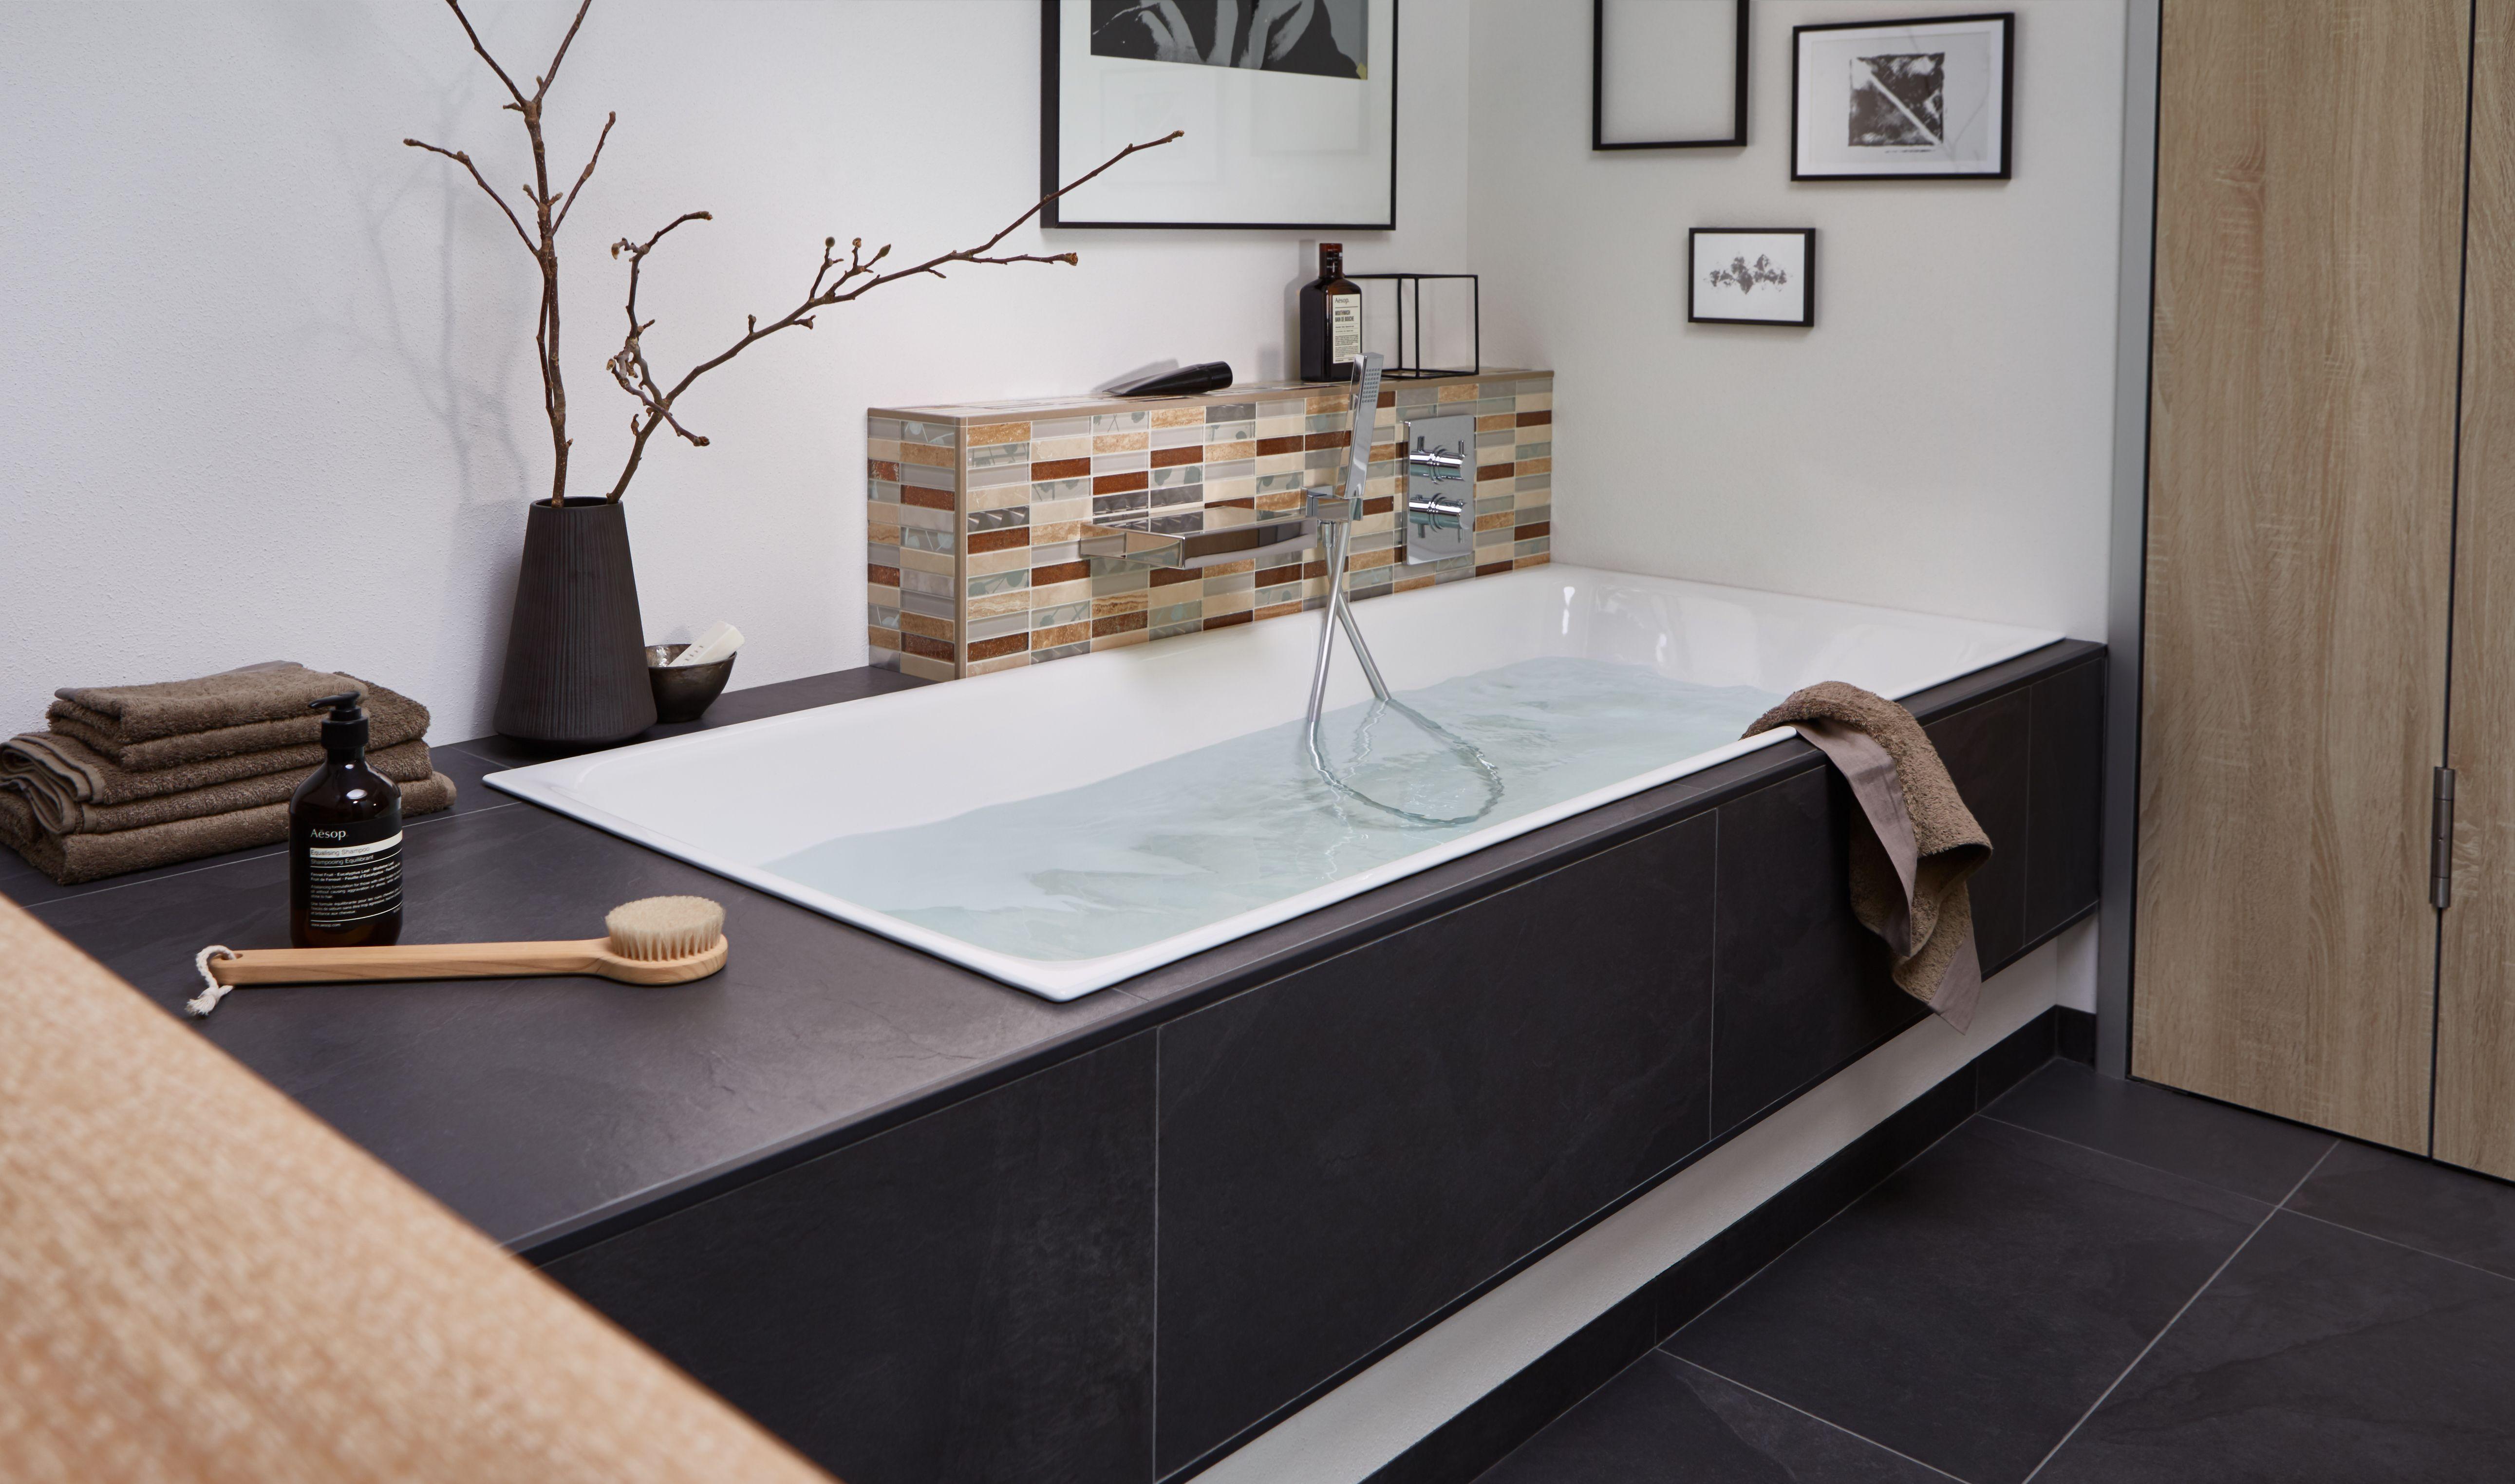 Blanke New York Edition In 2020 Badezimmer Trends Eingelassene Badewanne Badezimmer Design